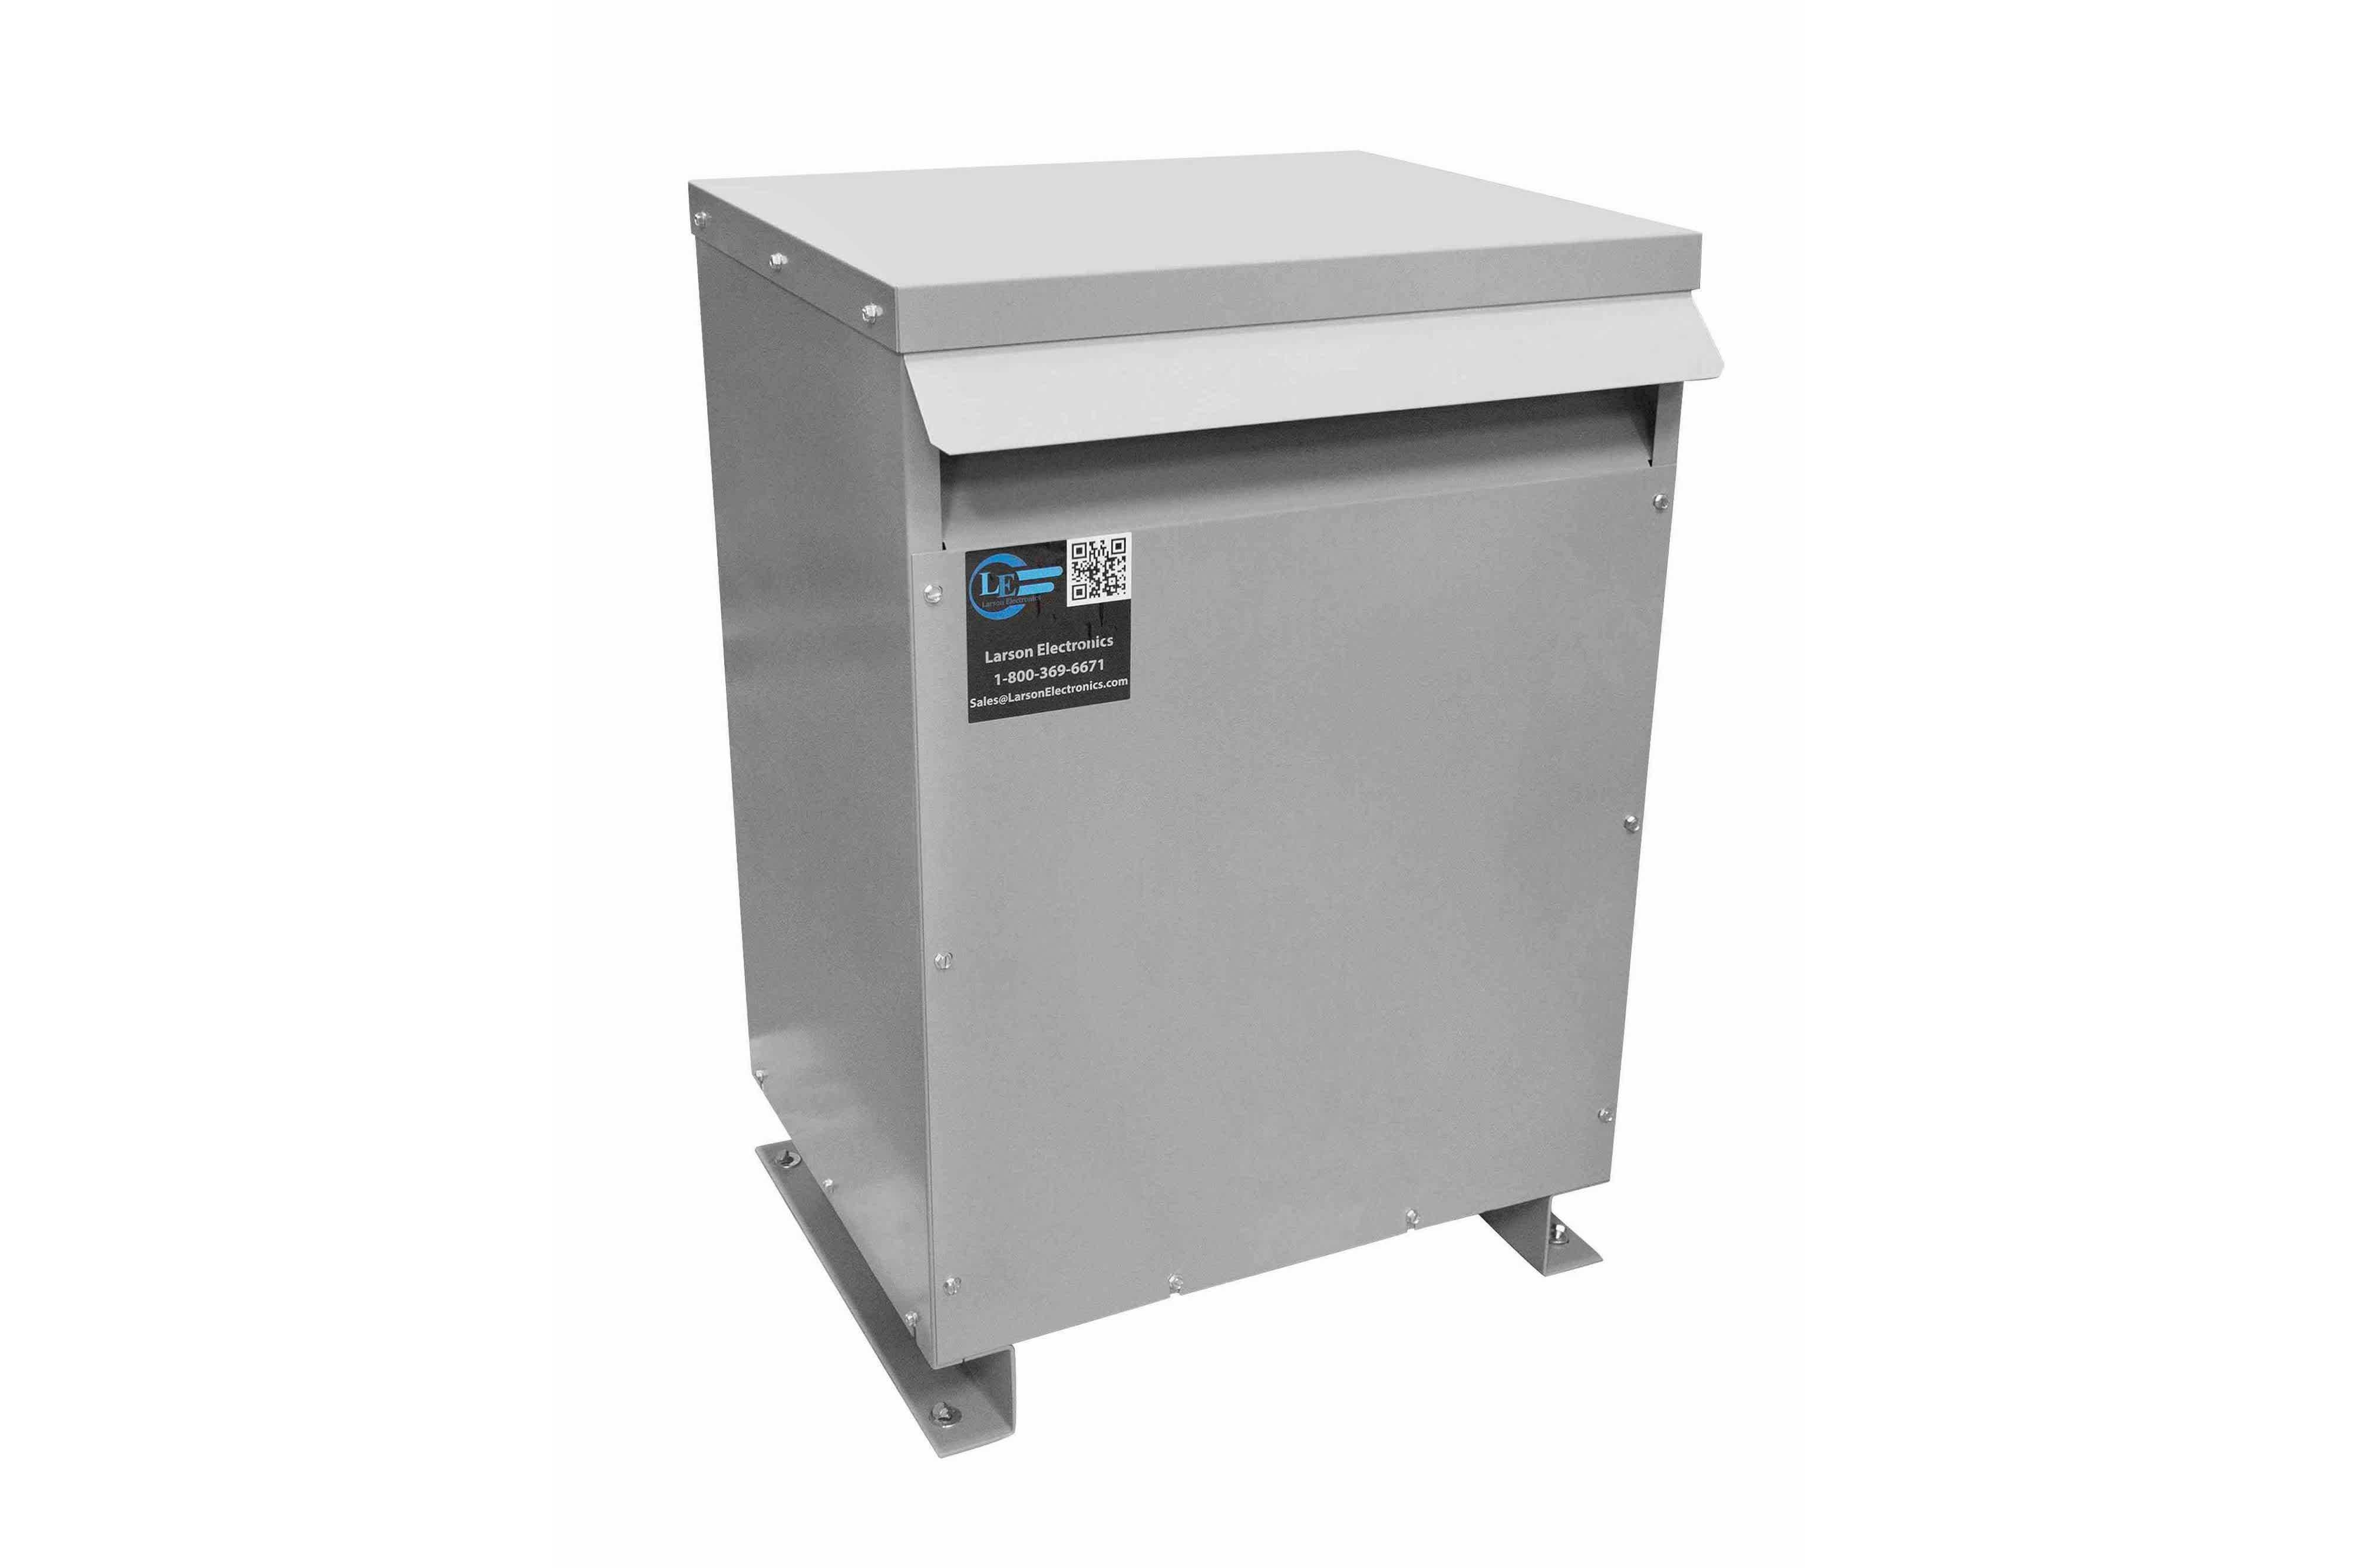 80 kVA 3PH Isolation Transformer, 460V Wye Primary, 415V Delta Secondary, N3R, Ventilated, 60 Hz